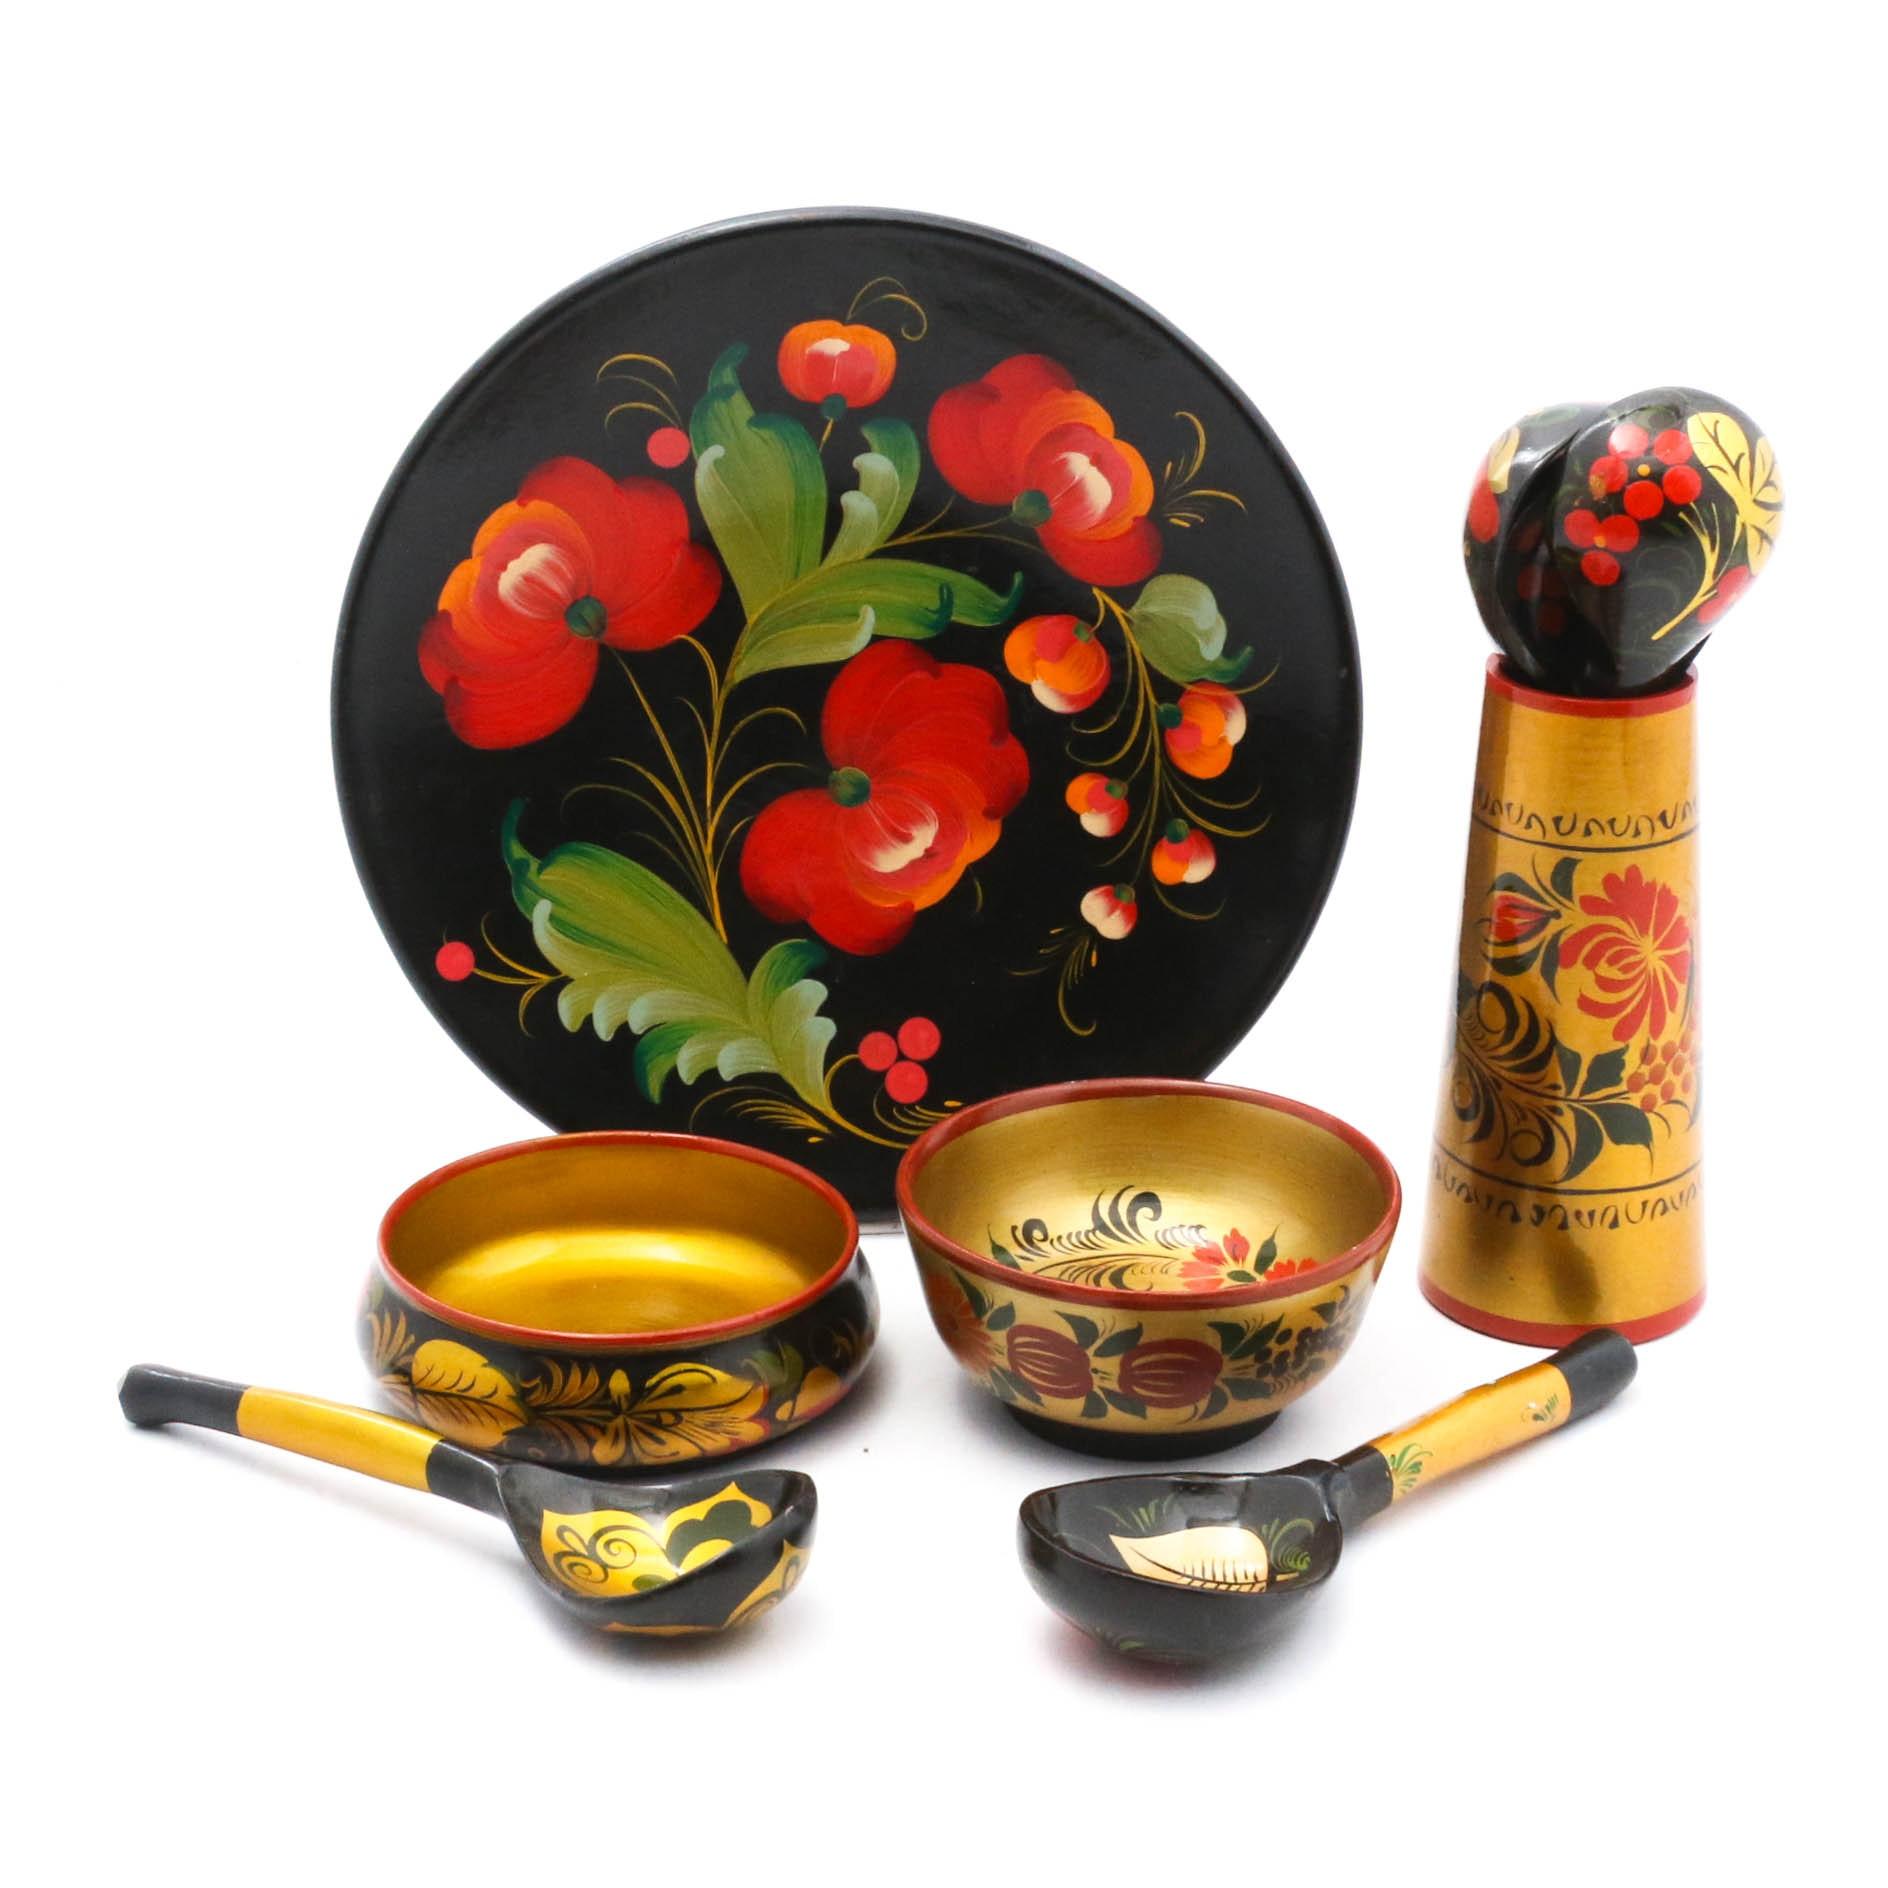 Vintage Russian Lacquerware Decorative Tableware